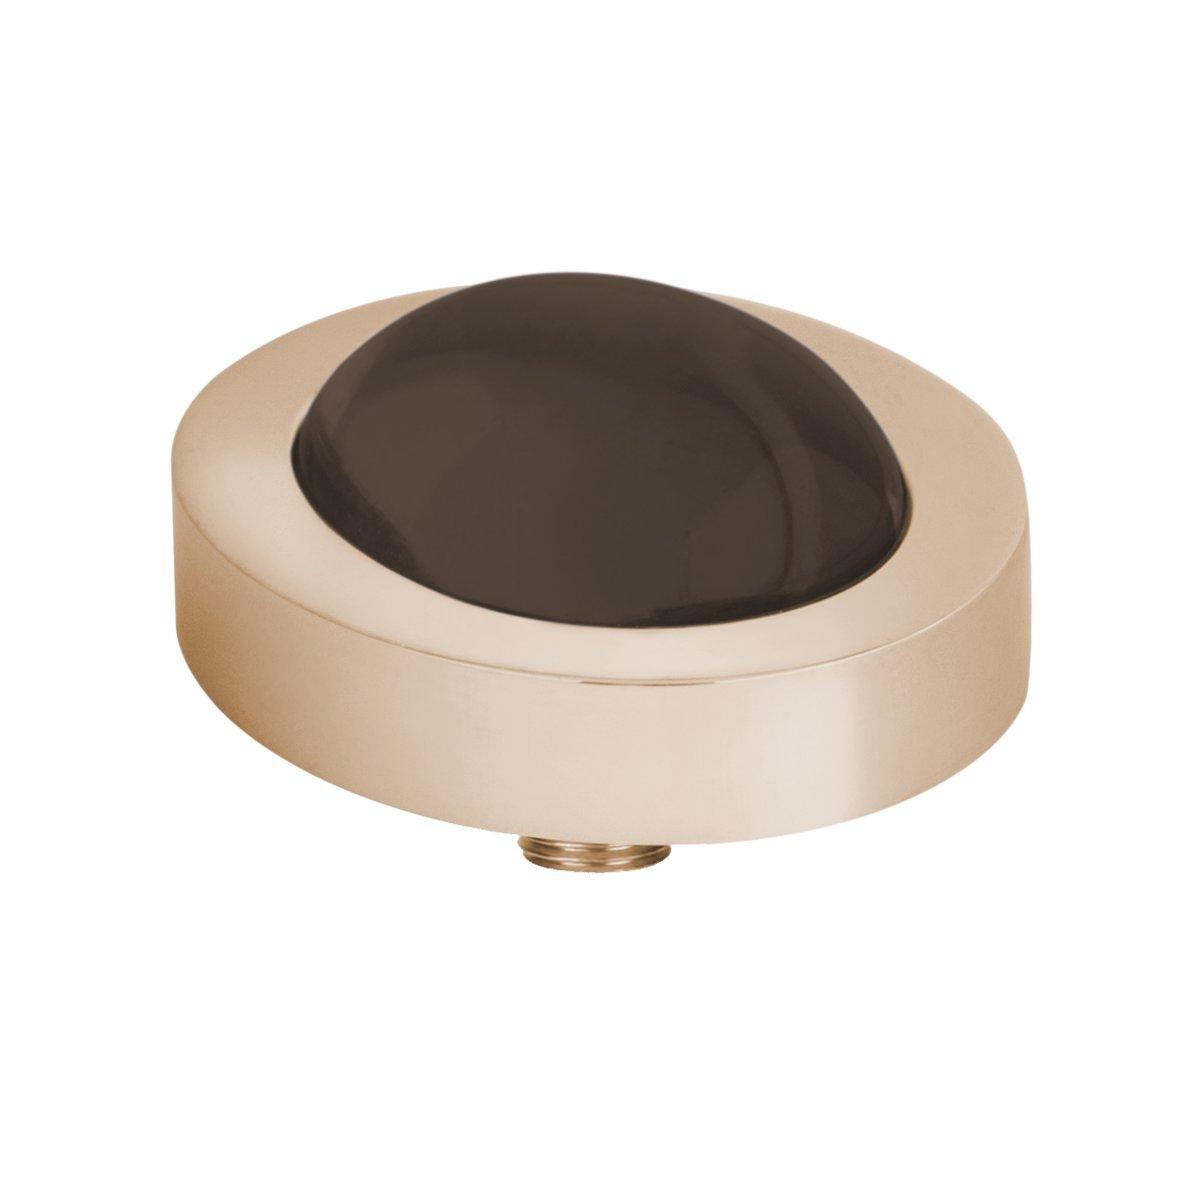 Melano vivid oval steentje - coffee - dames - rosekleurig - 10 mm kopen